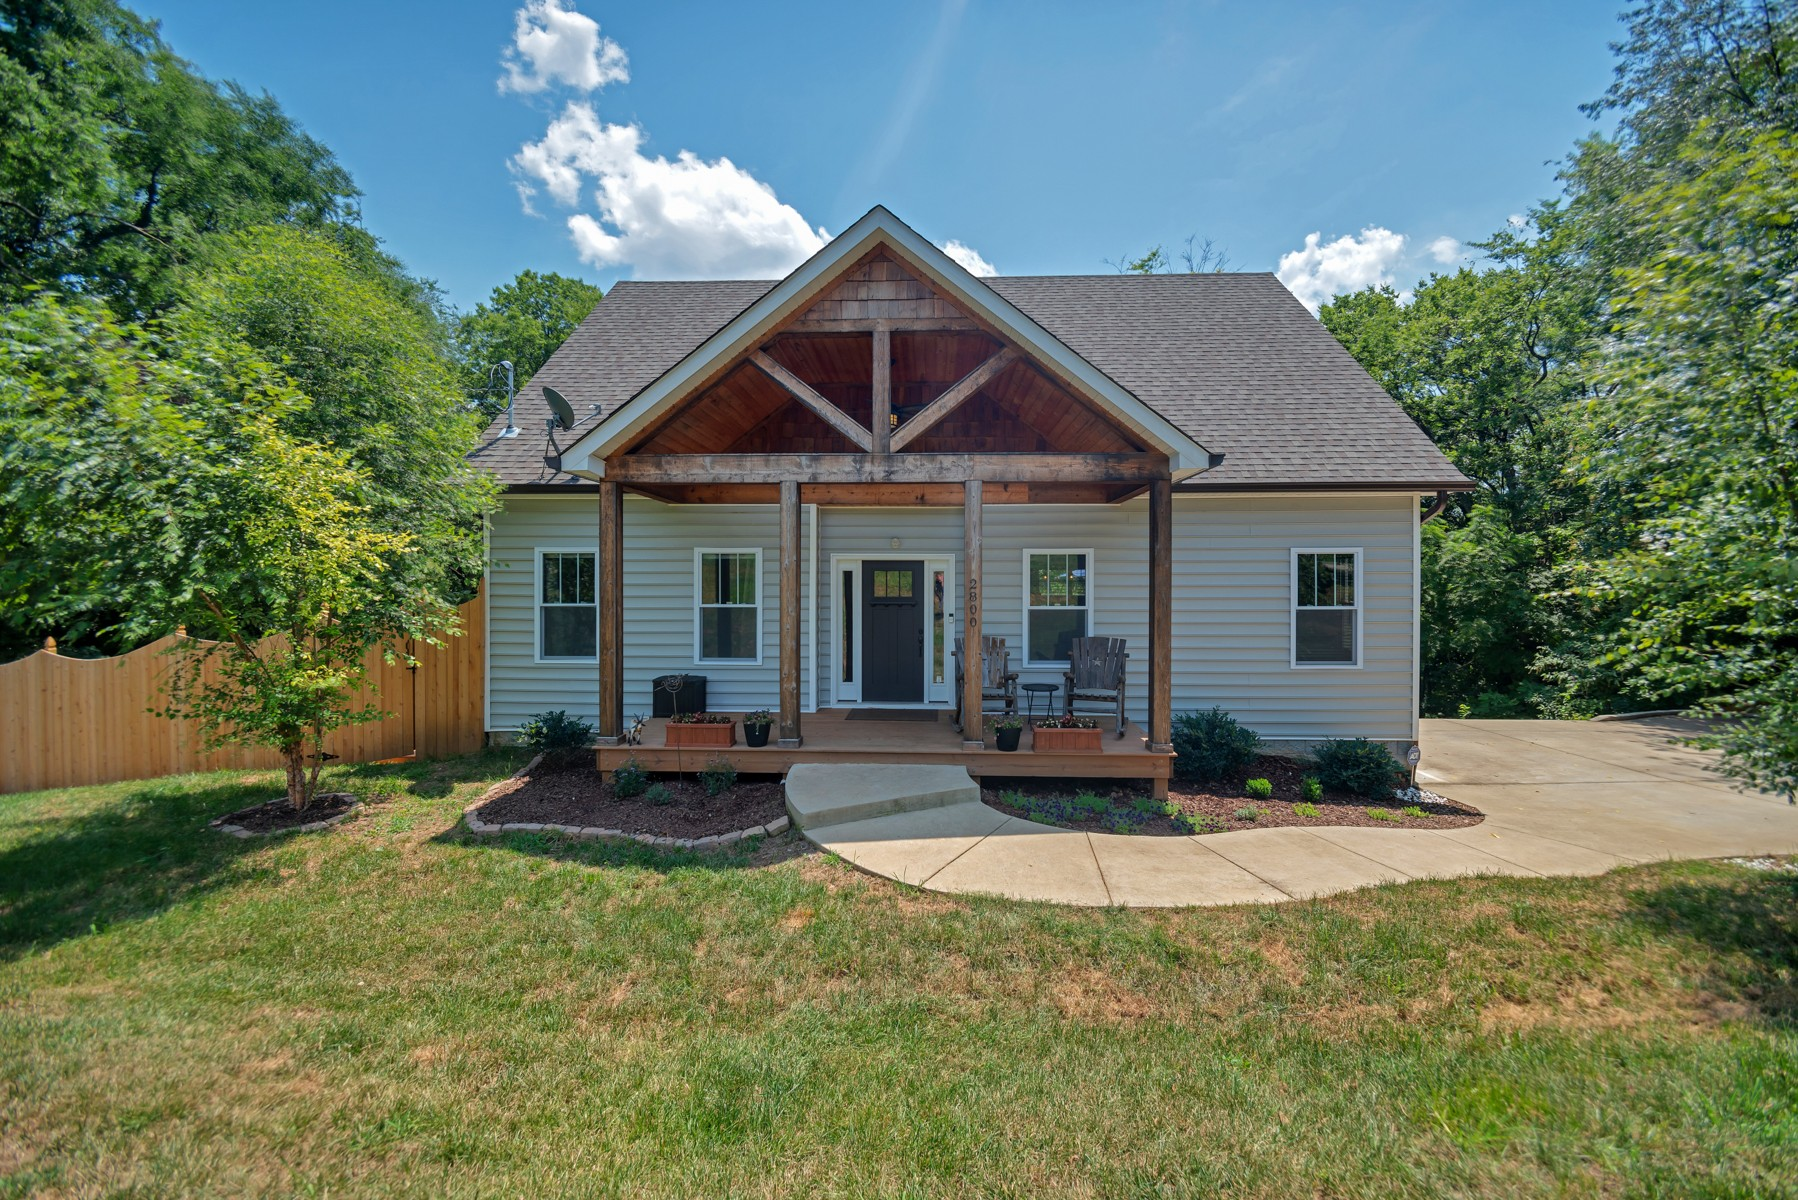 2800 Ennis Rd, Nashville, TN 37210 - Nashville, TN real estate listing